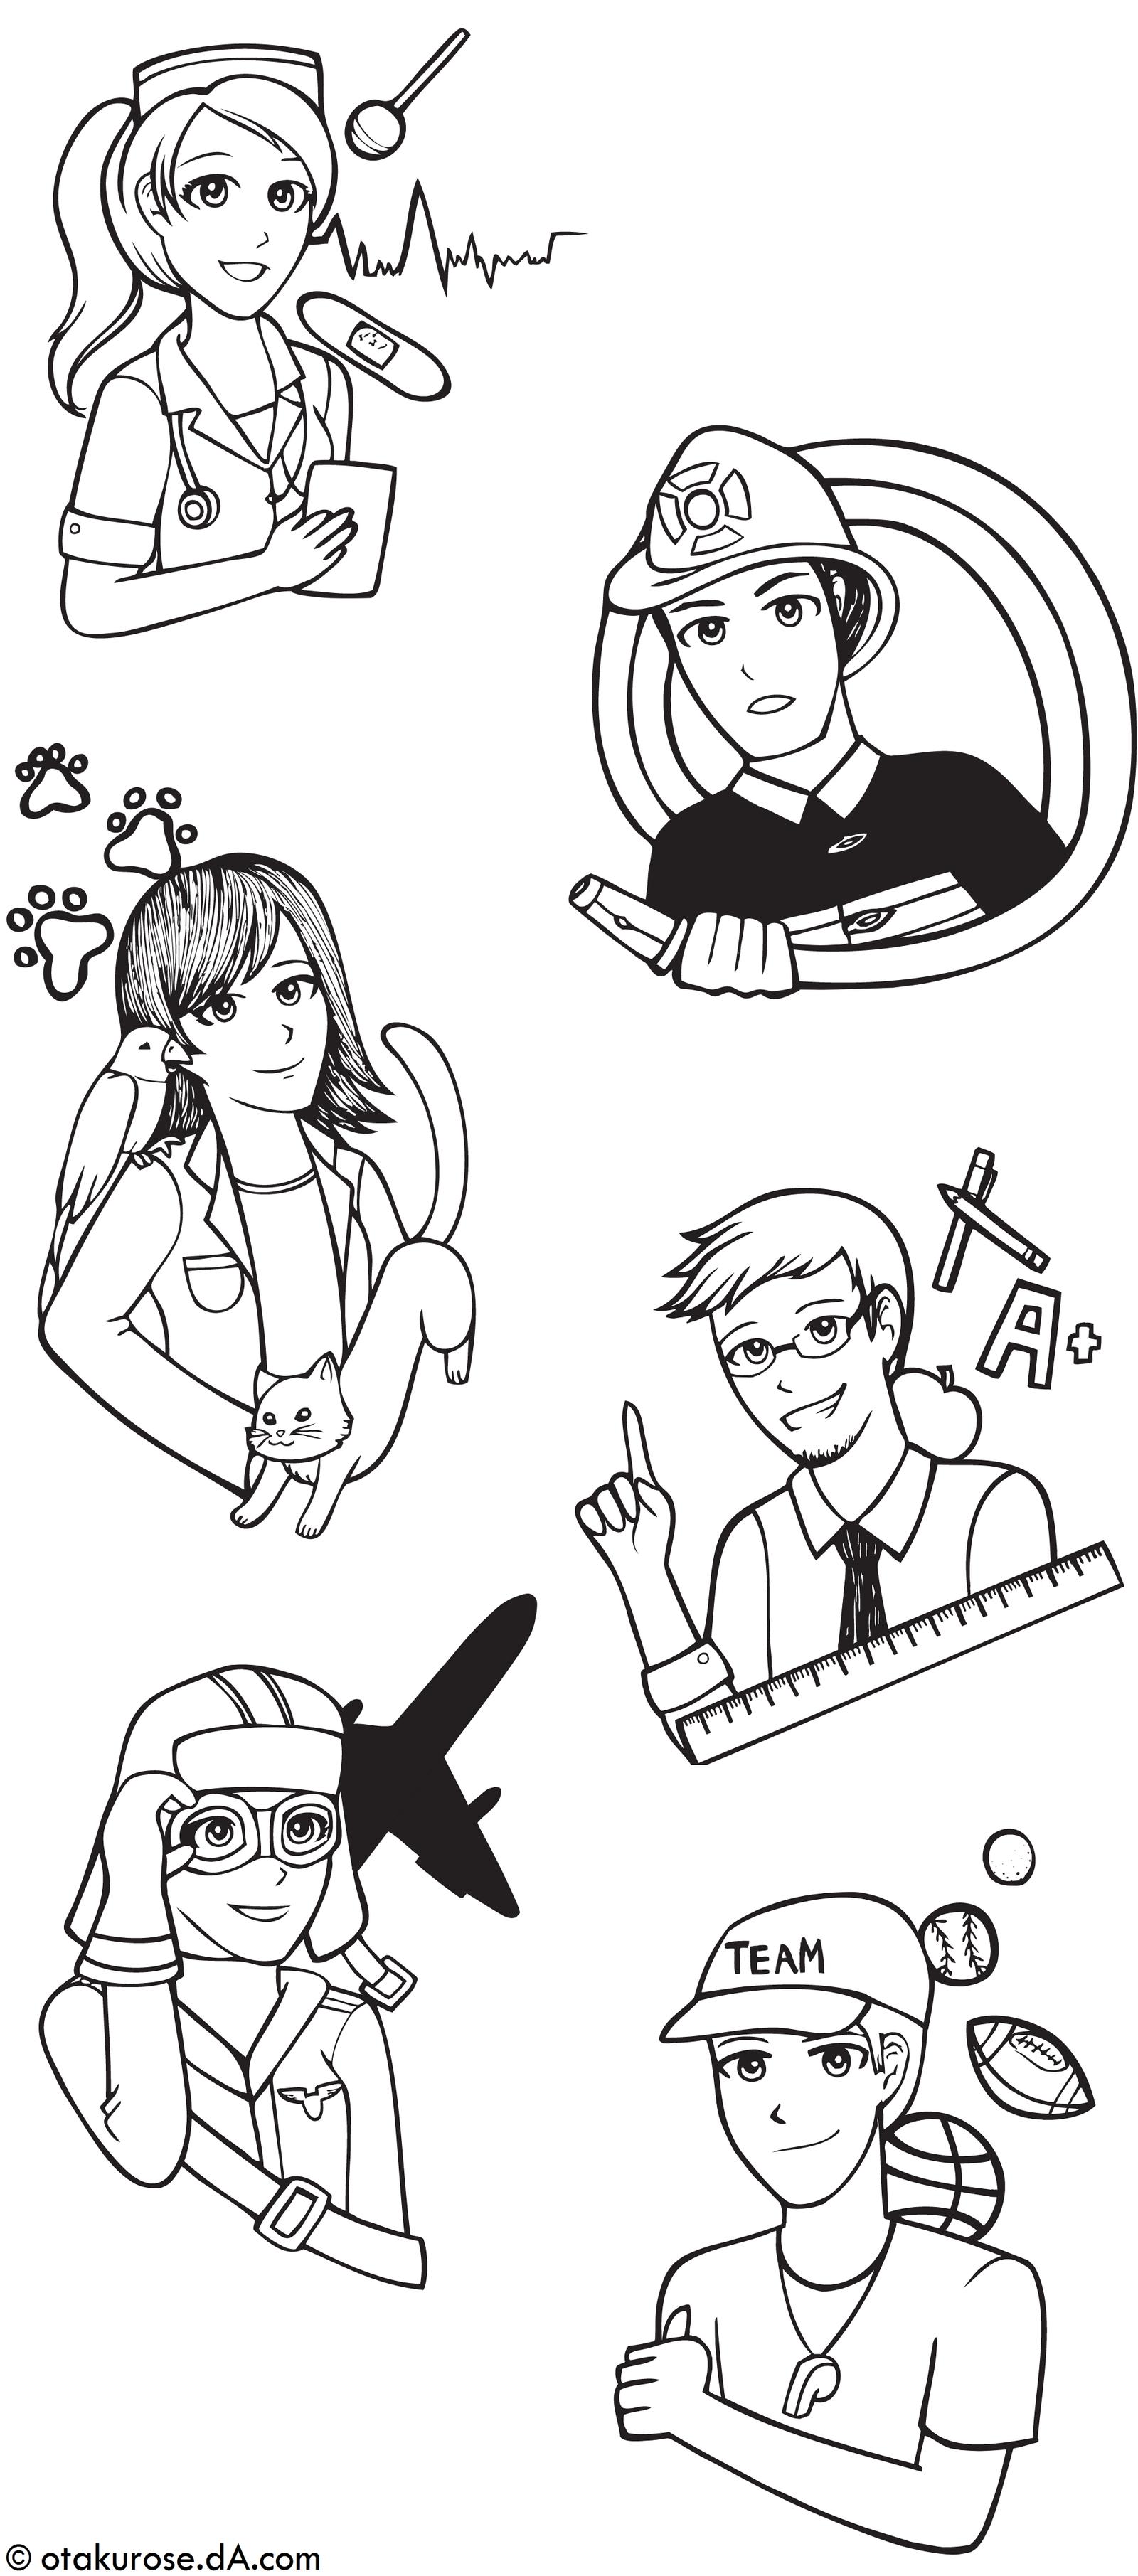 Bookmark of Careers by OtakuRose